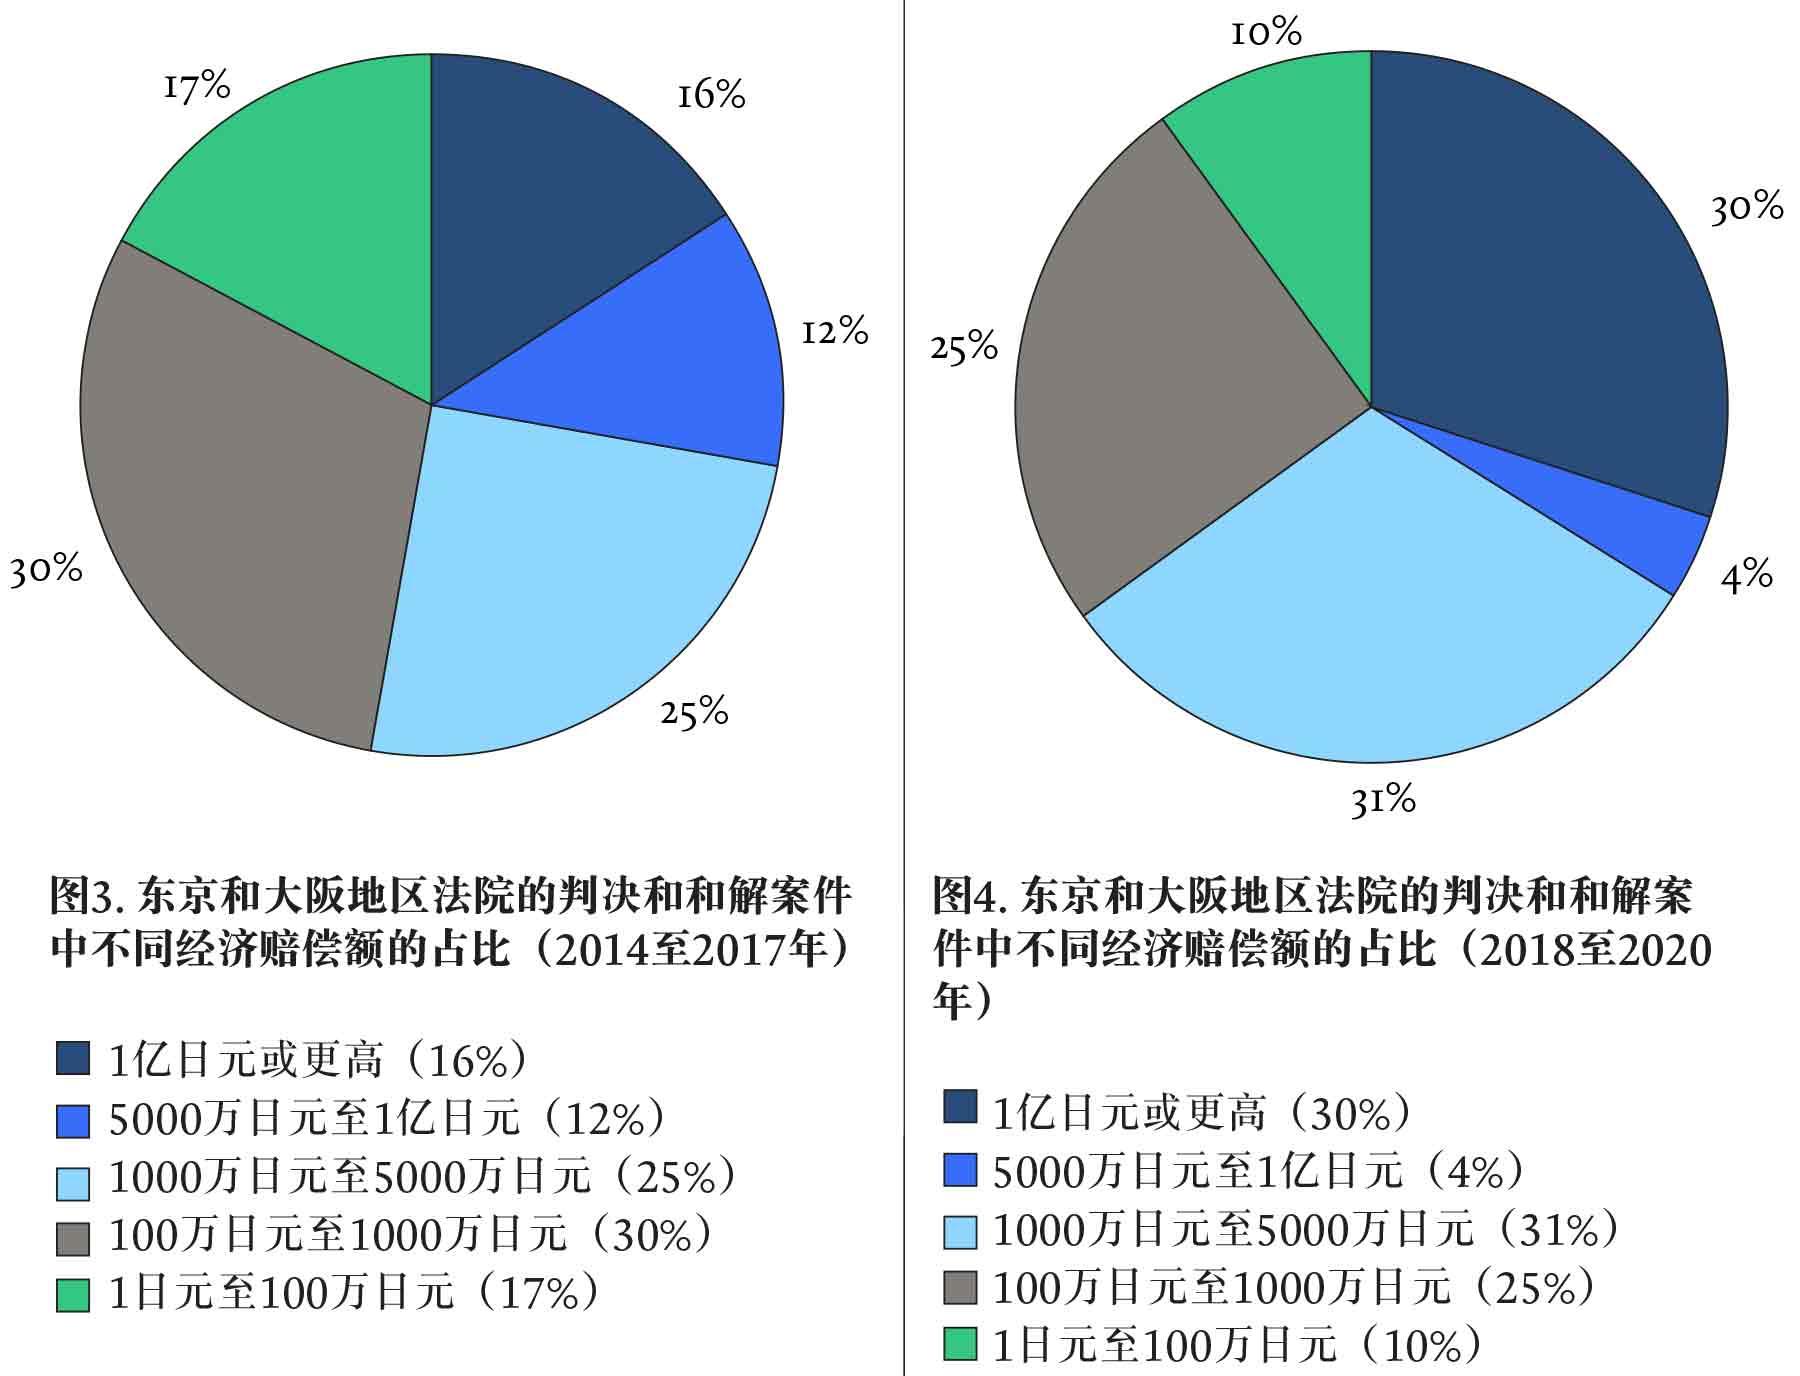 A-COMPARISON-OF-OF-PATENT-LAW-DEVELOPMENT-各国专利法发展对比-Chart-3-4-Chin